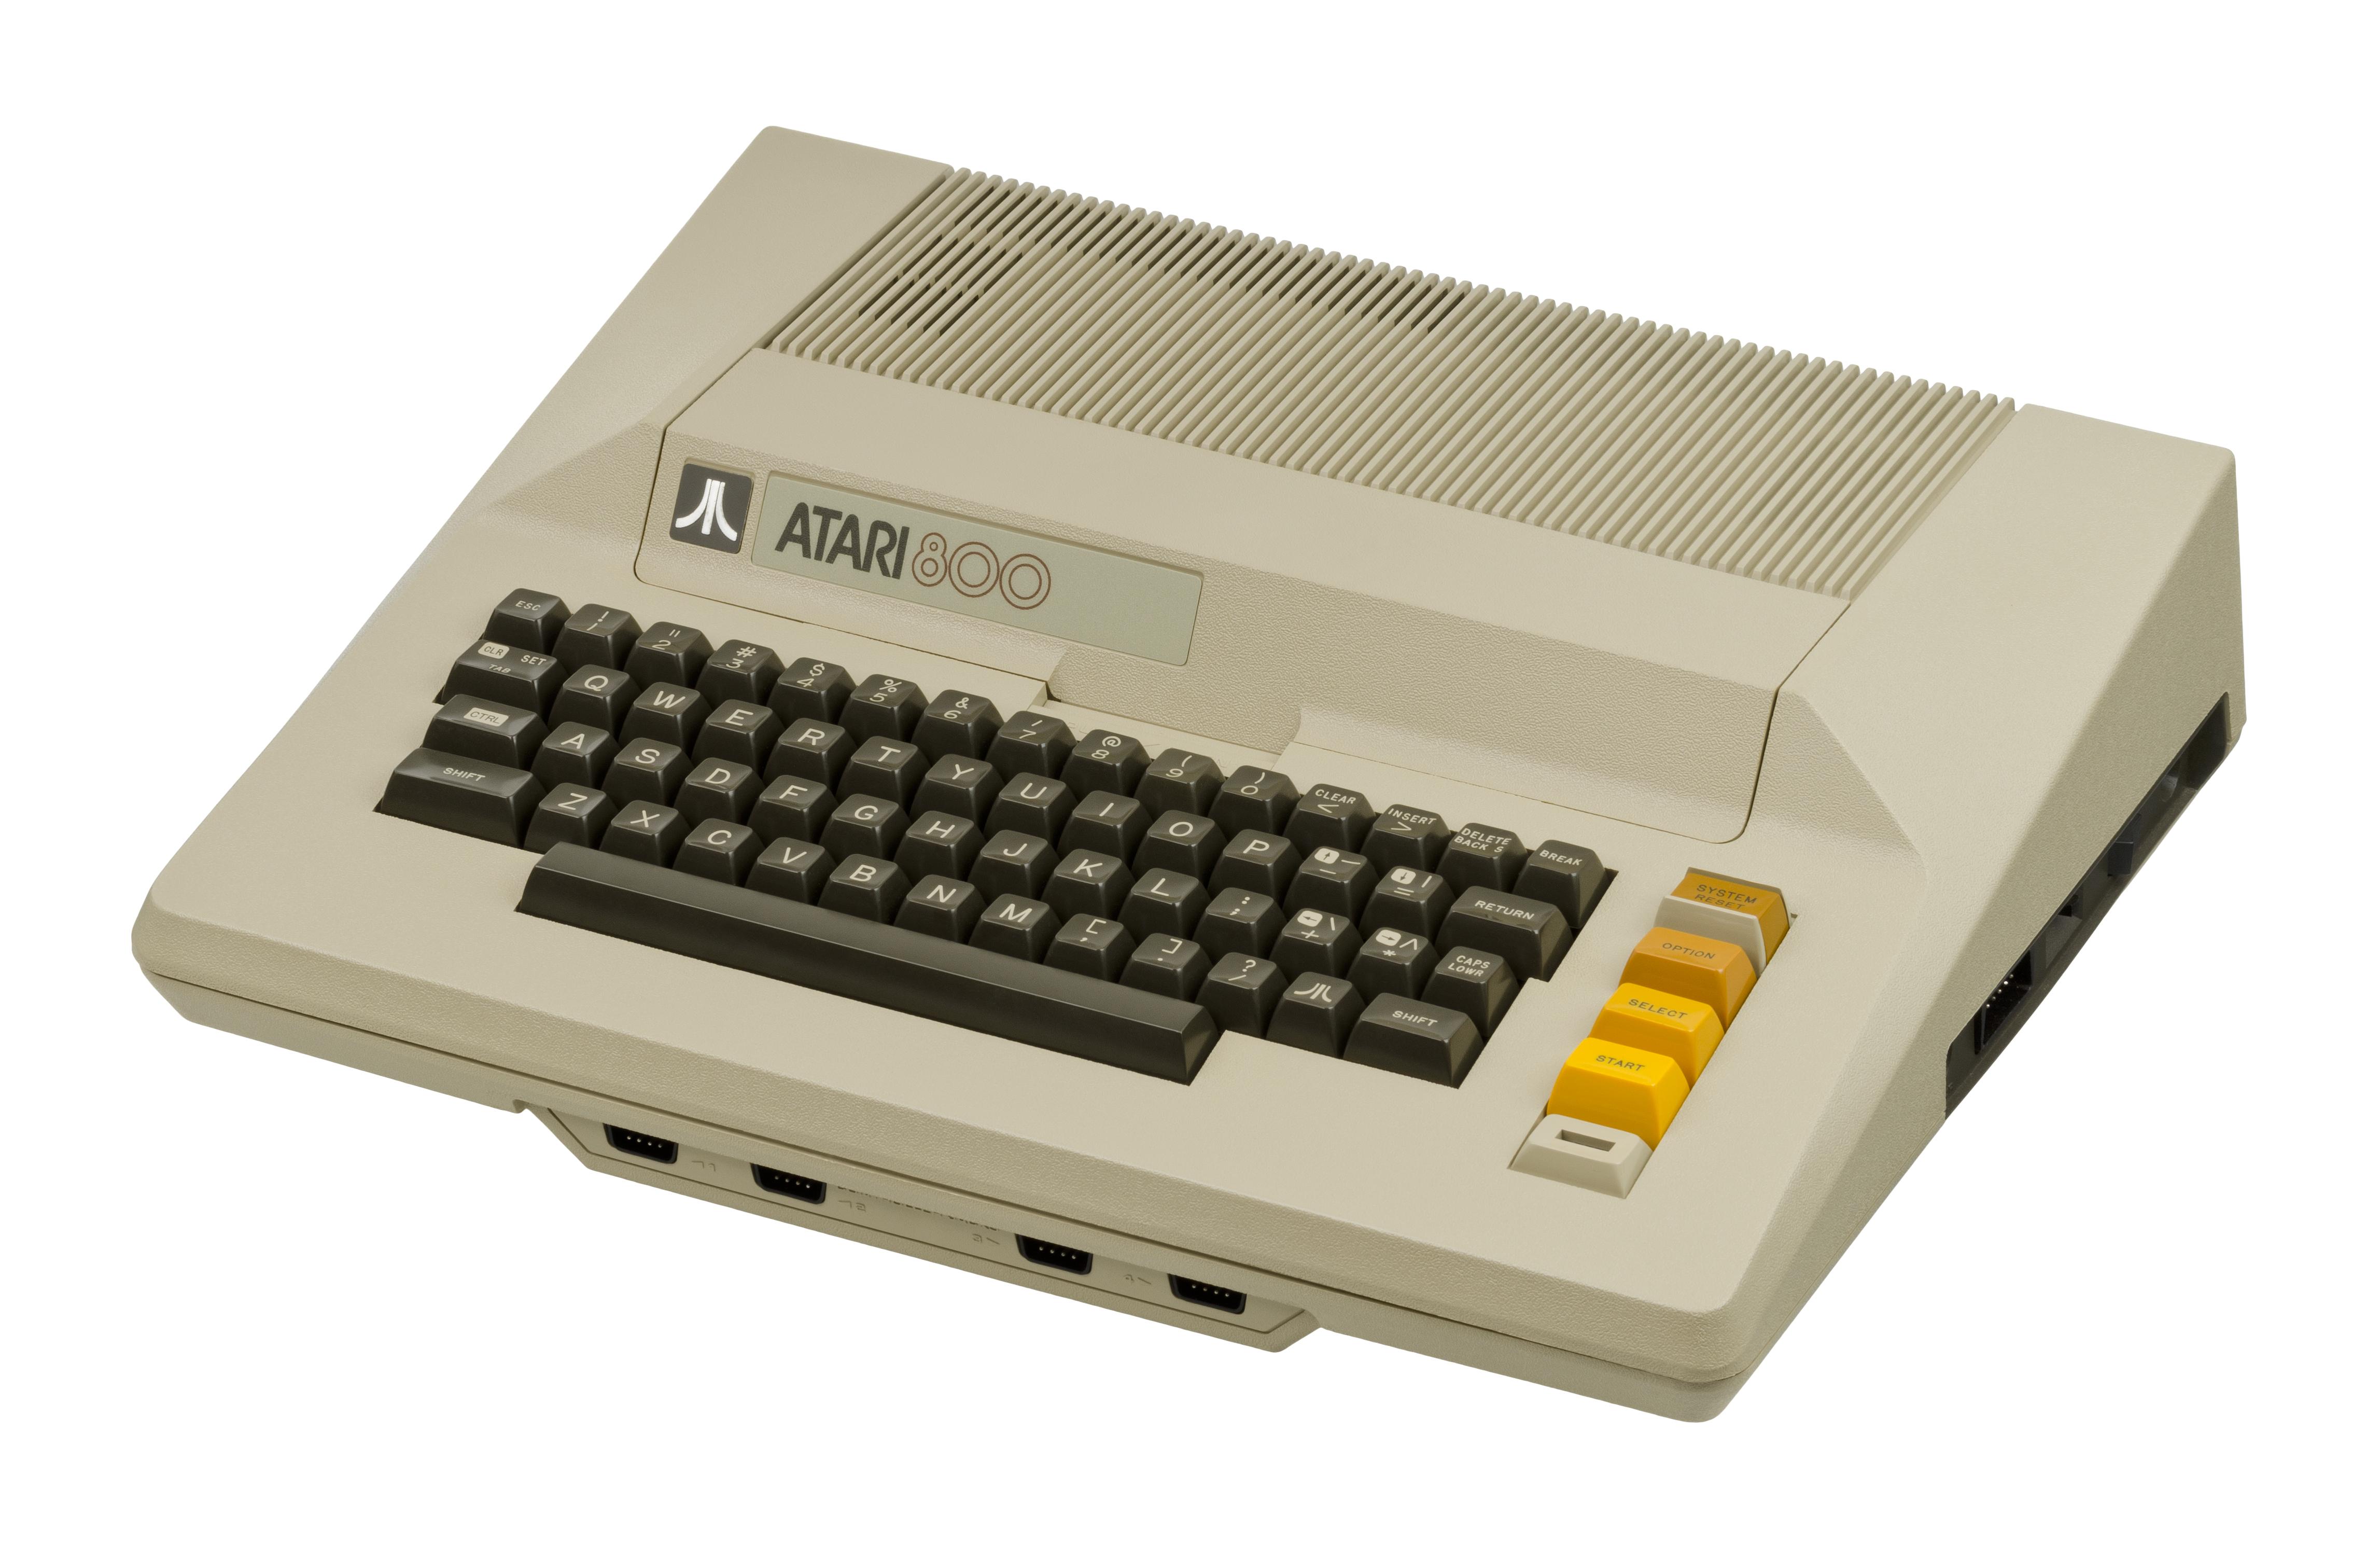 Hook up Atari 400